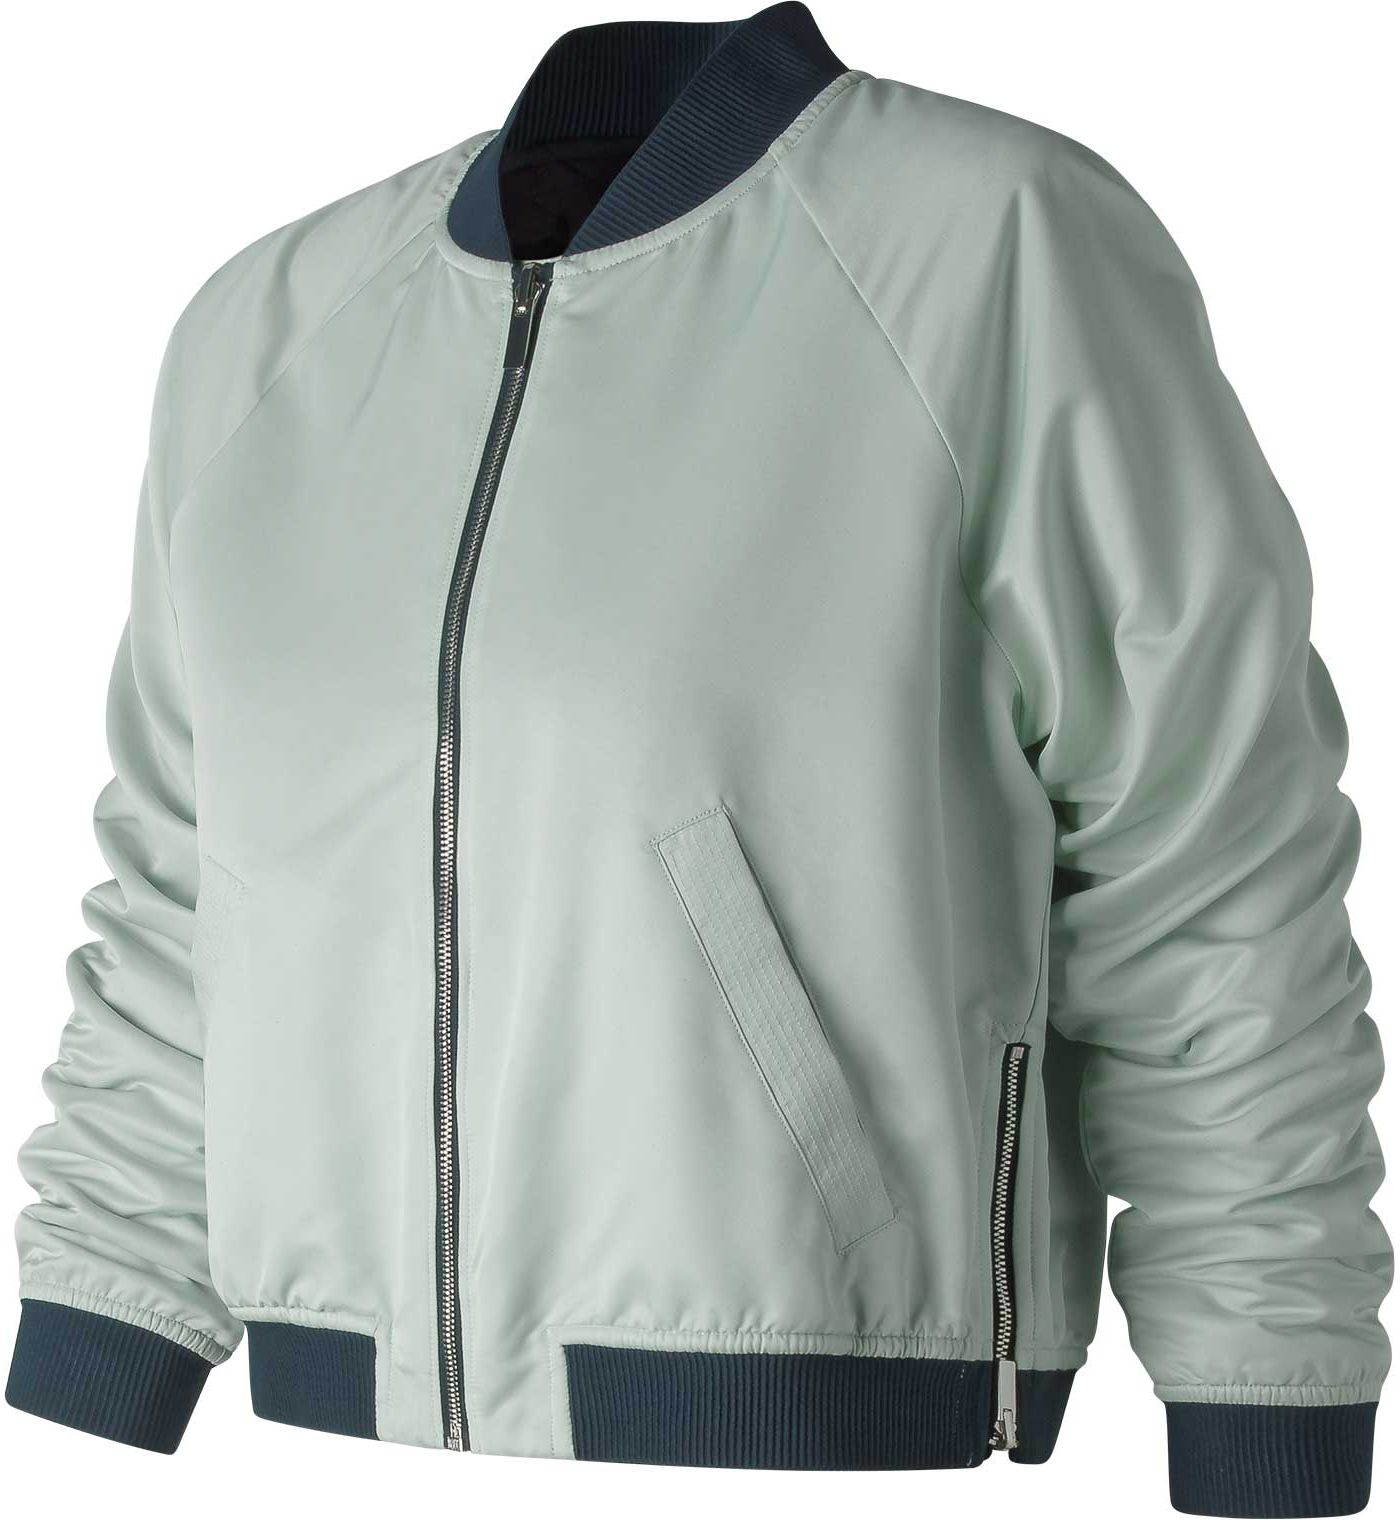 New Balance Women's Heat Loft Reversible Bomber Jacket